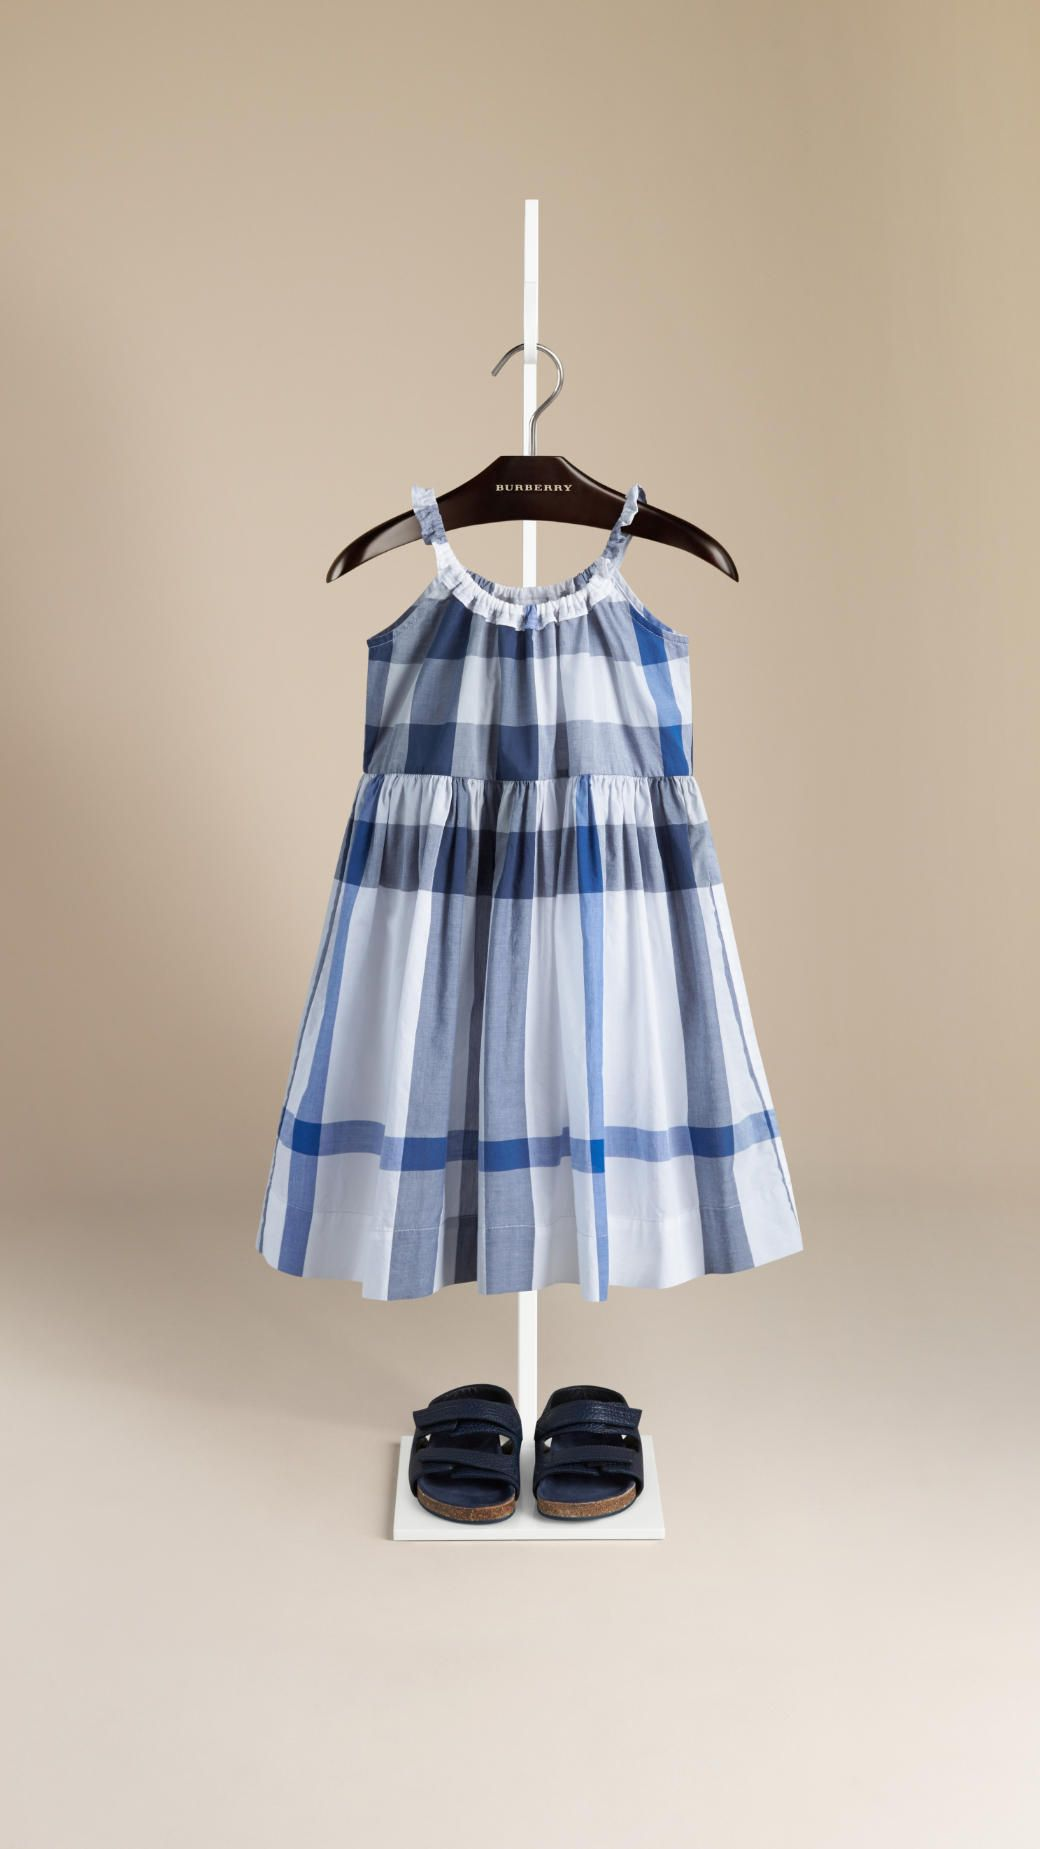 Frill Detail Check Cotton Dress Burberry